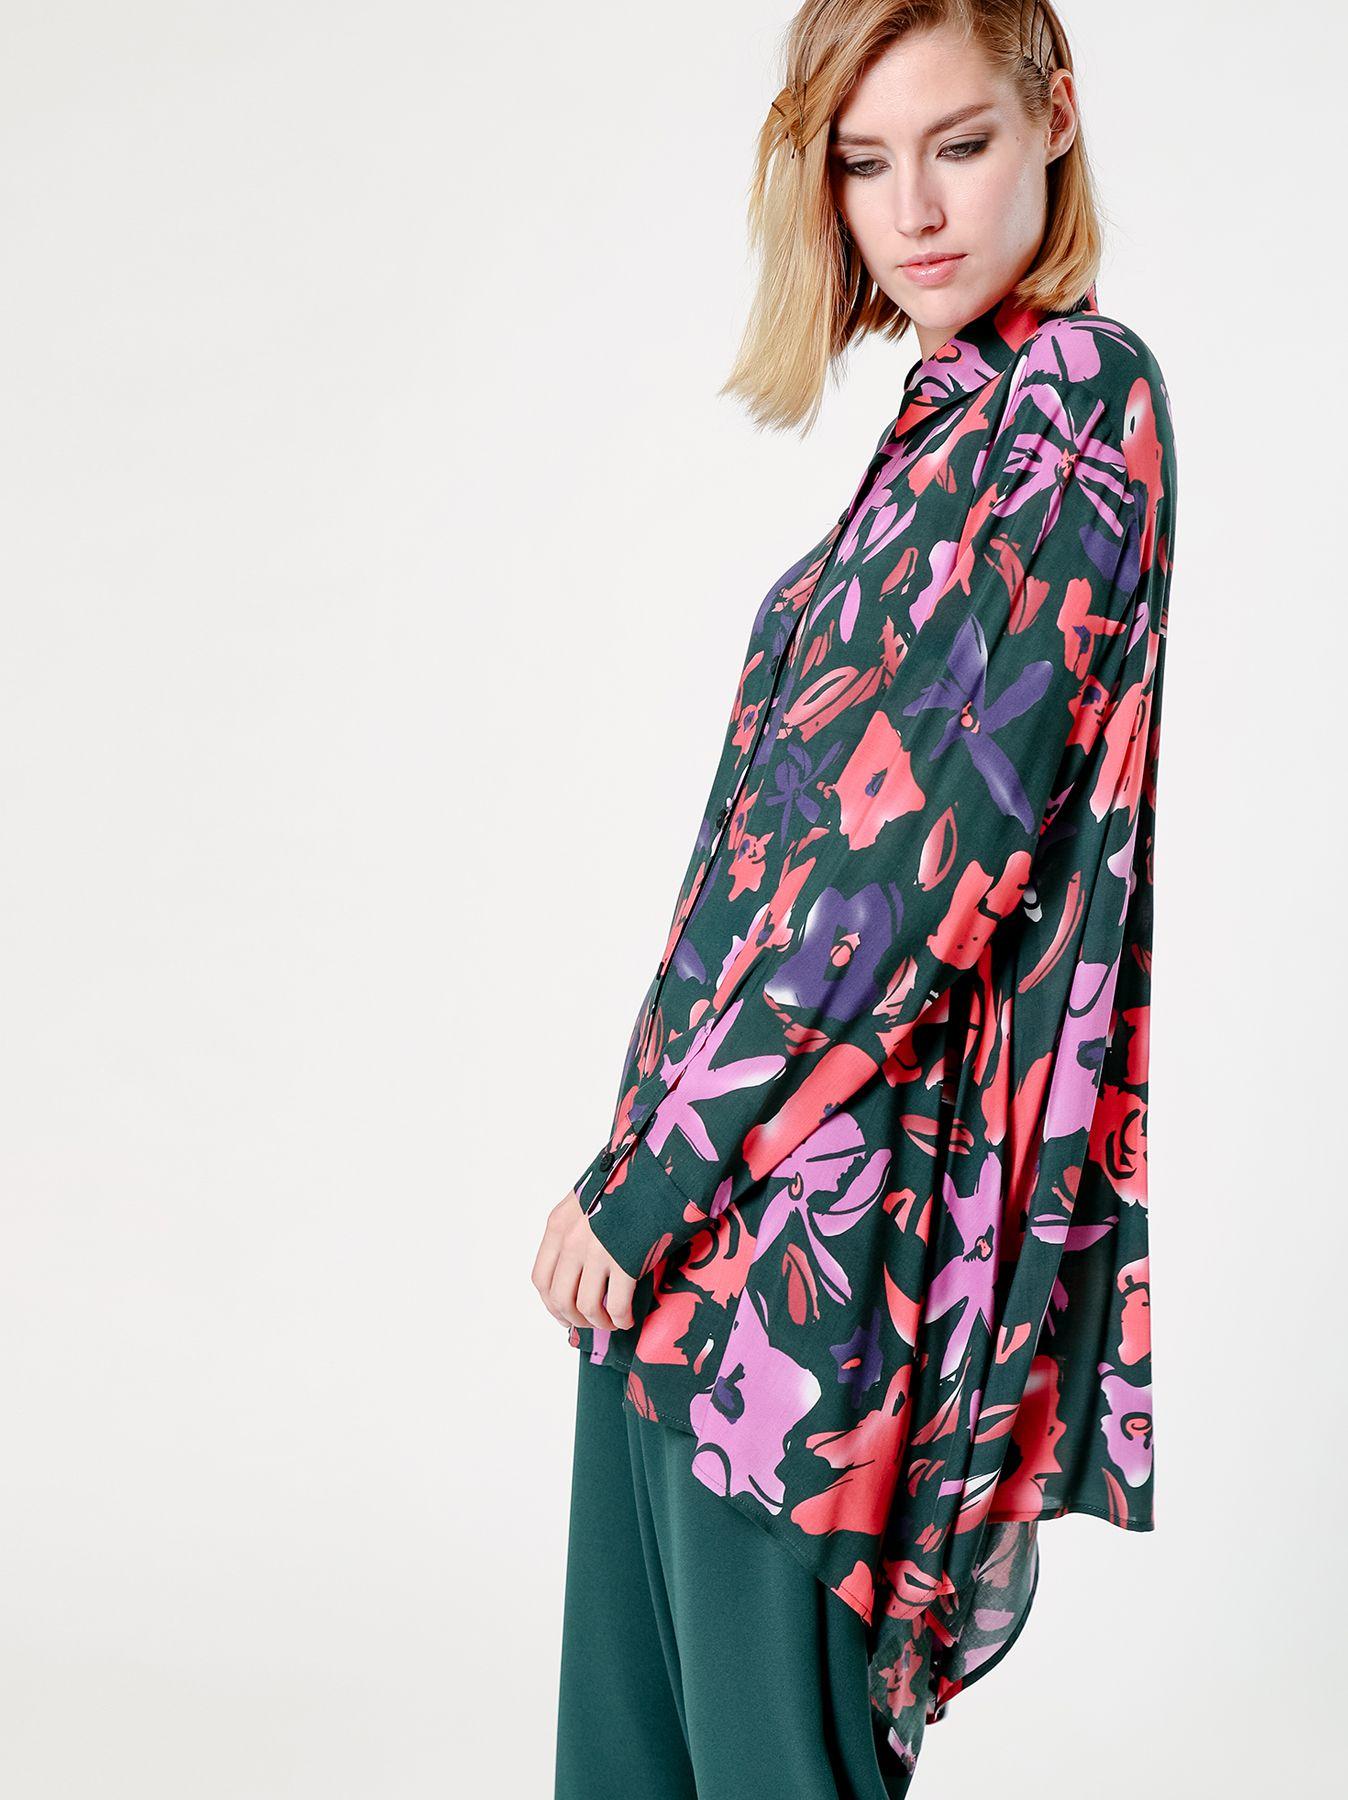 Camicia over con fantasia floreale